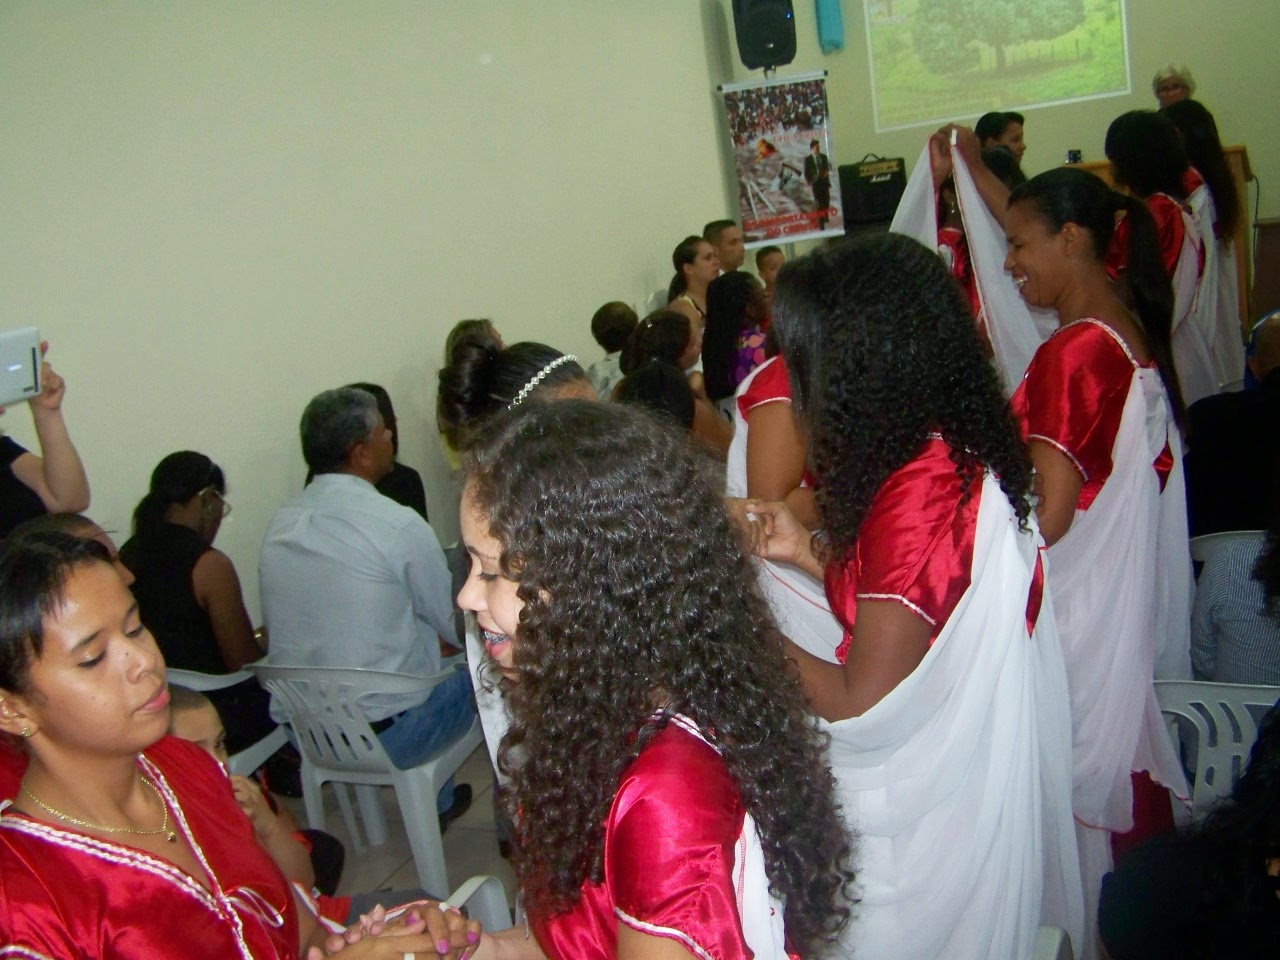 Grupo de coreografia - Igreja de Terra Boa